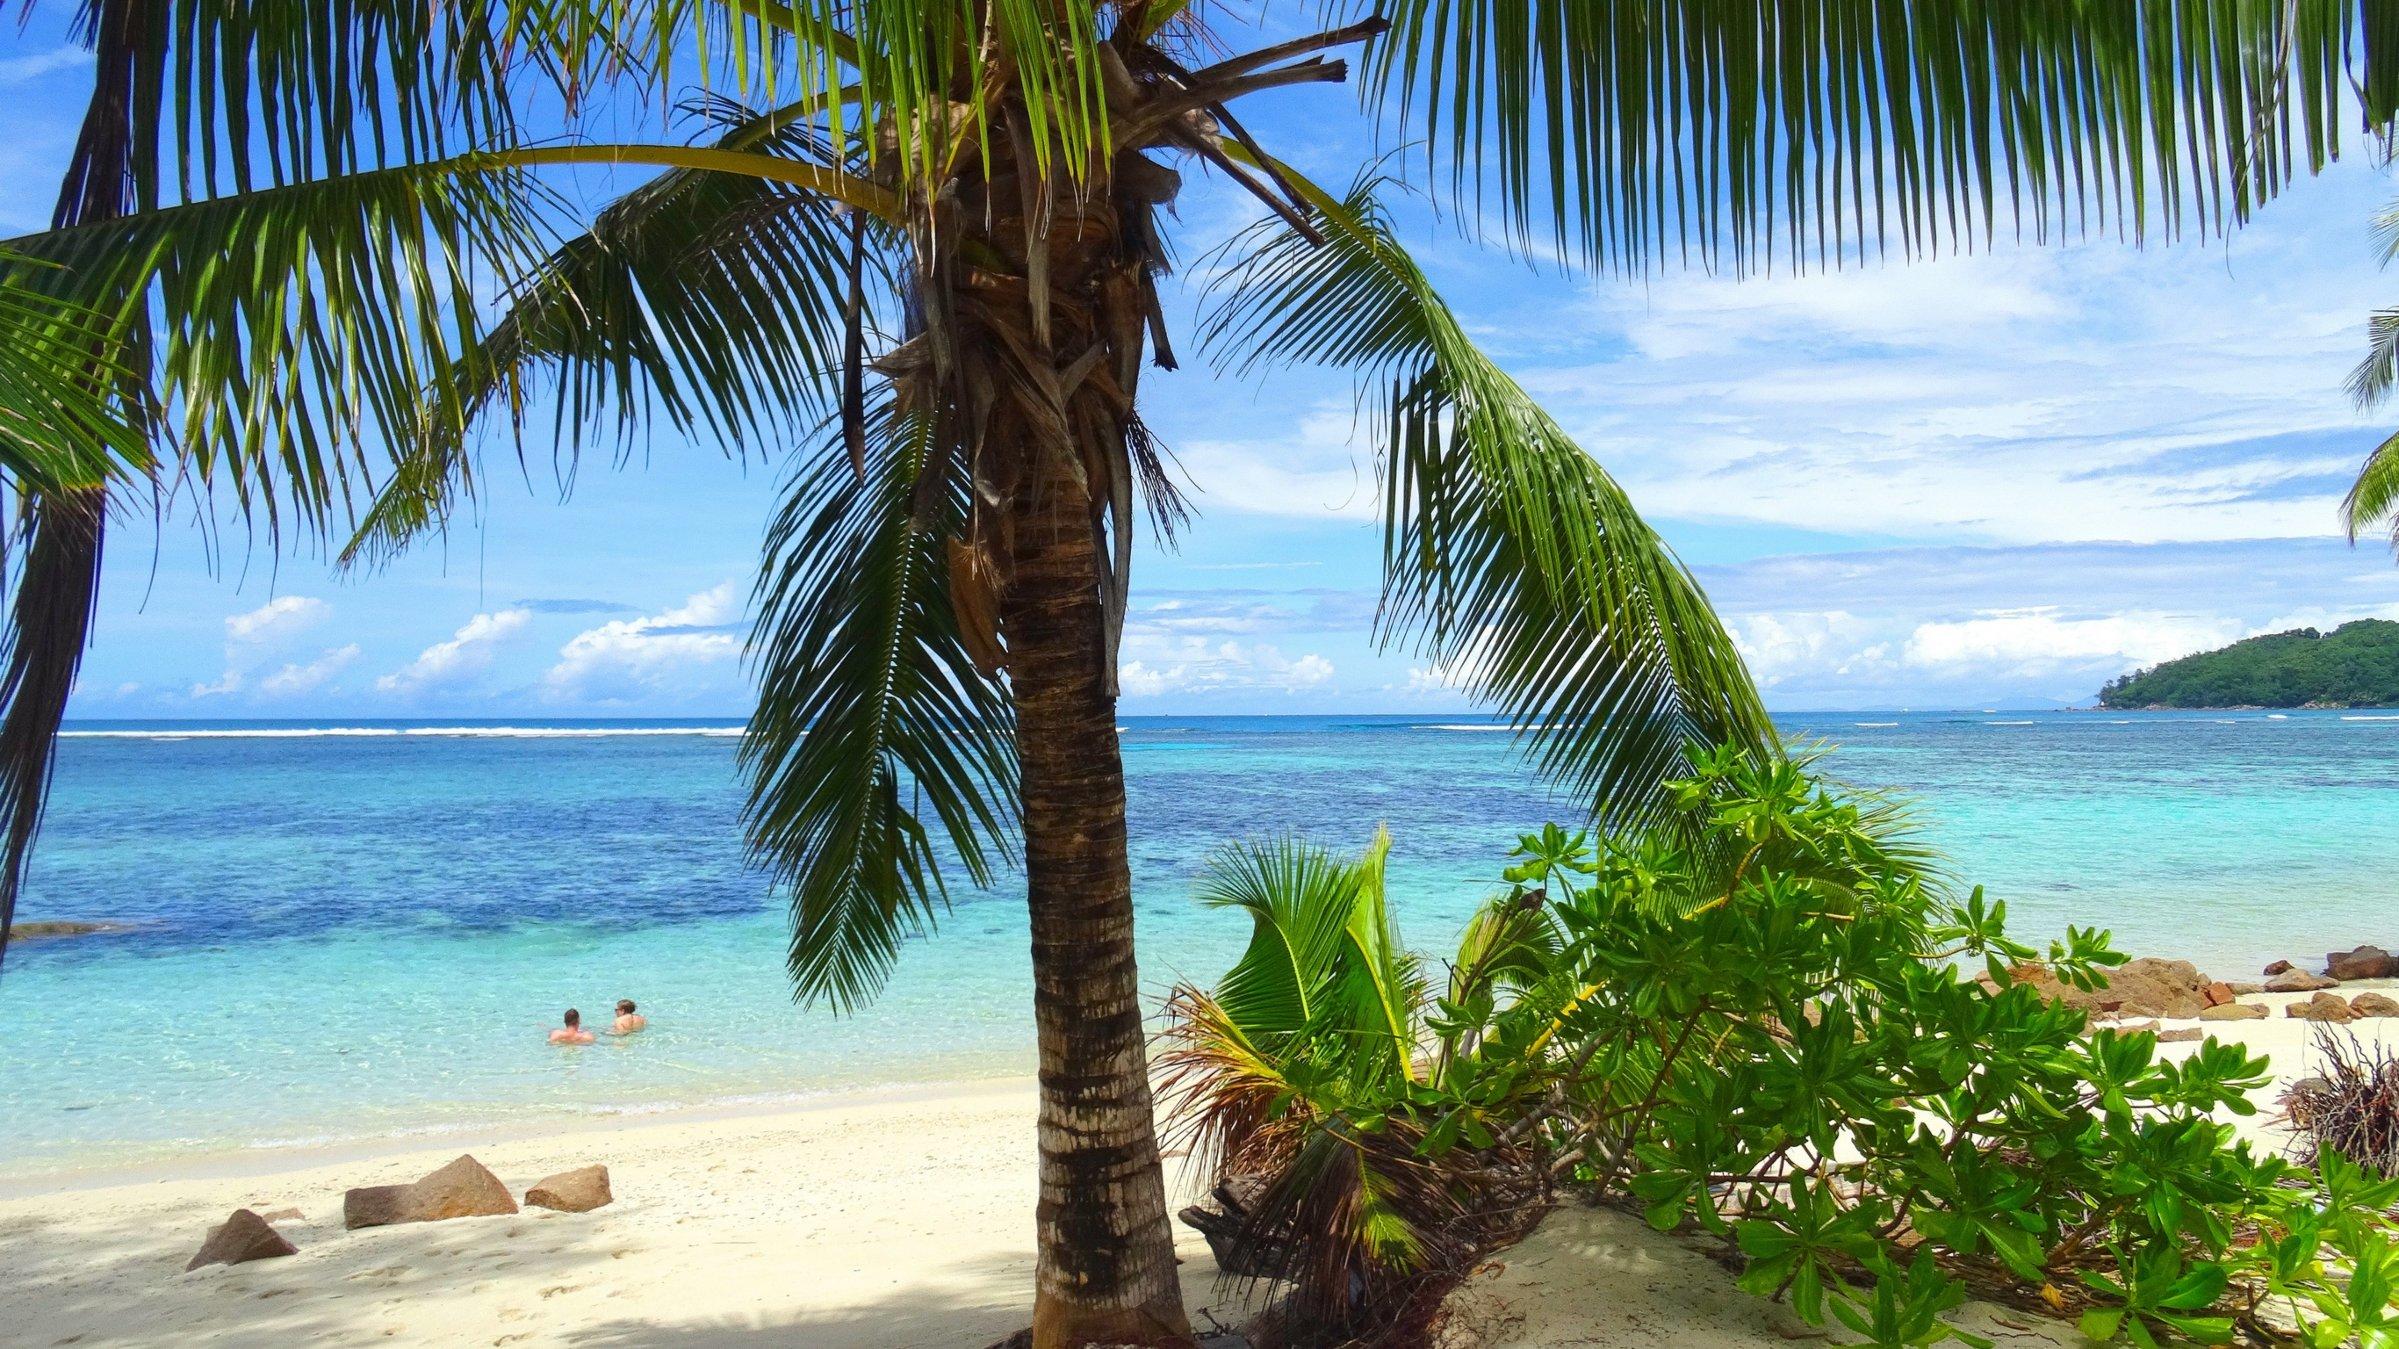 4-Day Magical Mahe - Seychelles Itinerary